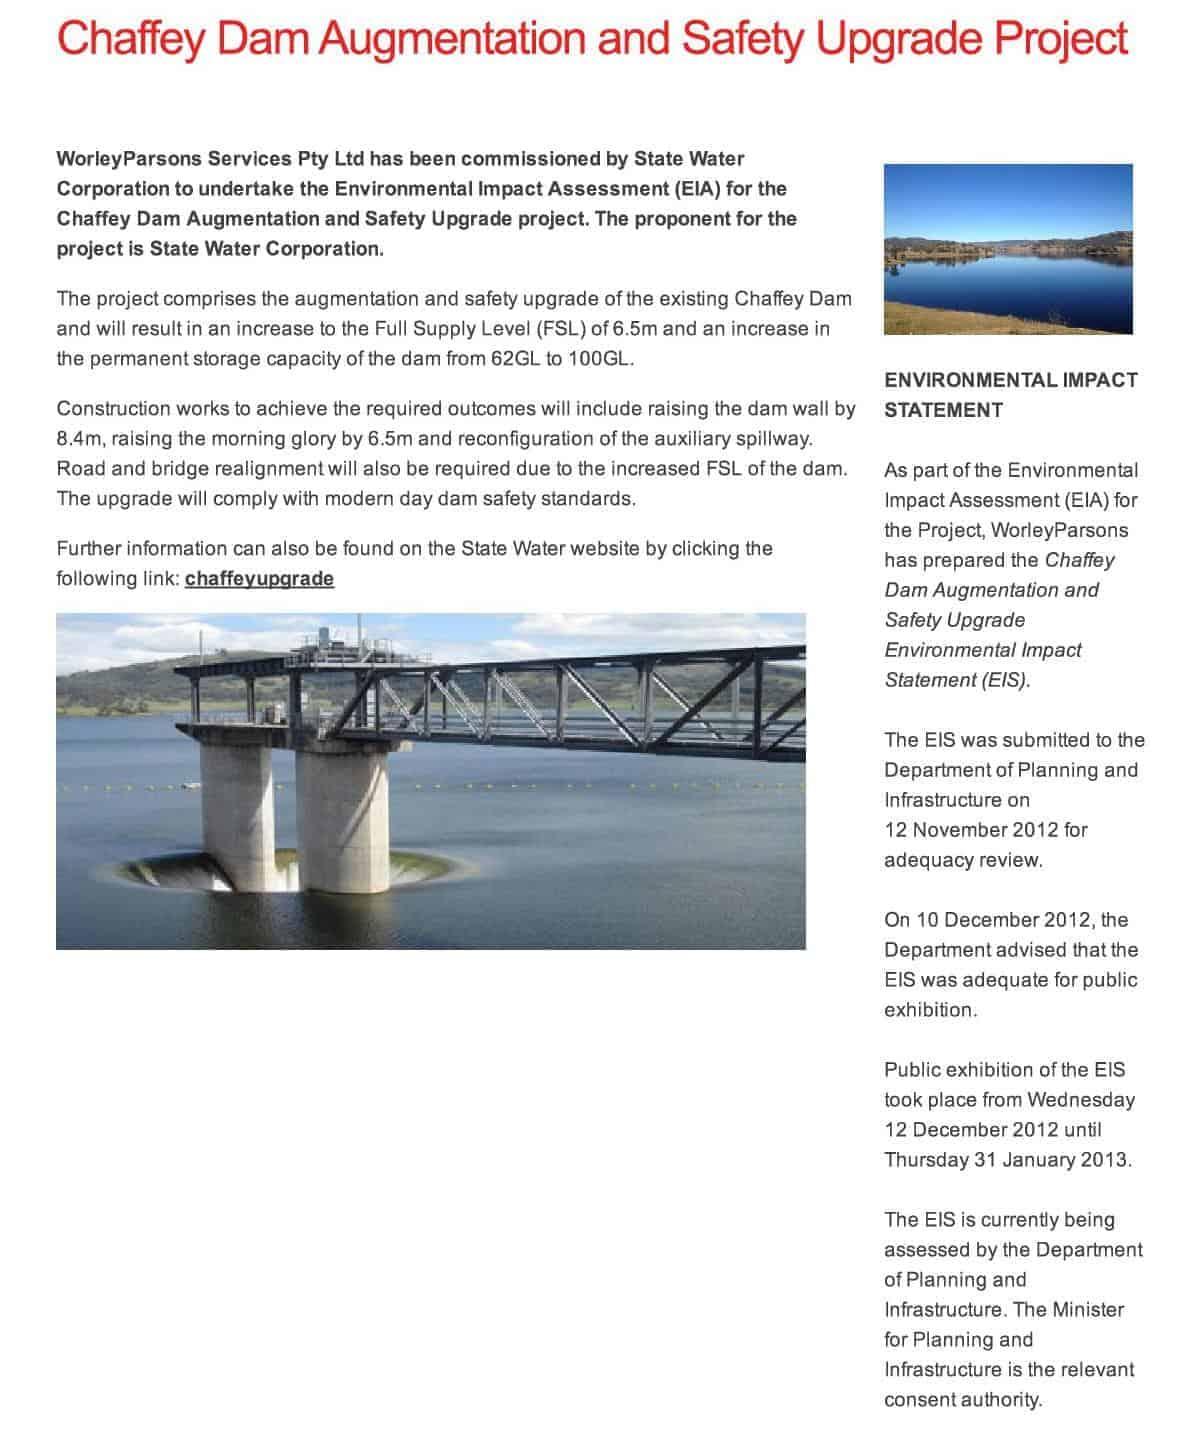 Chaffey Dam Augmentation and Safety Upgrade Projectb